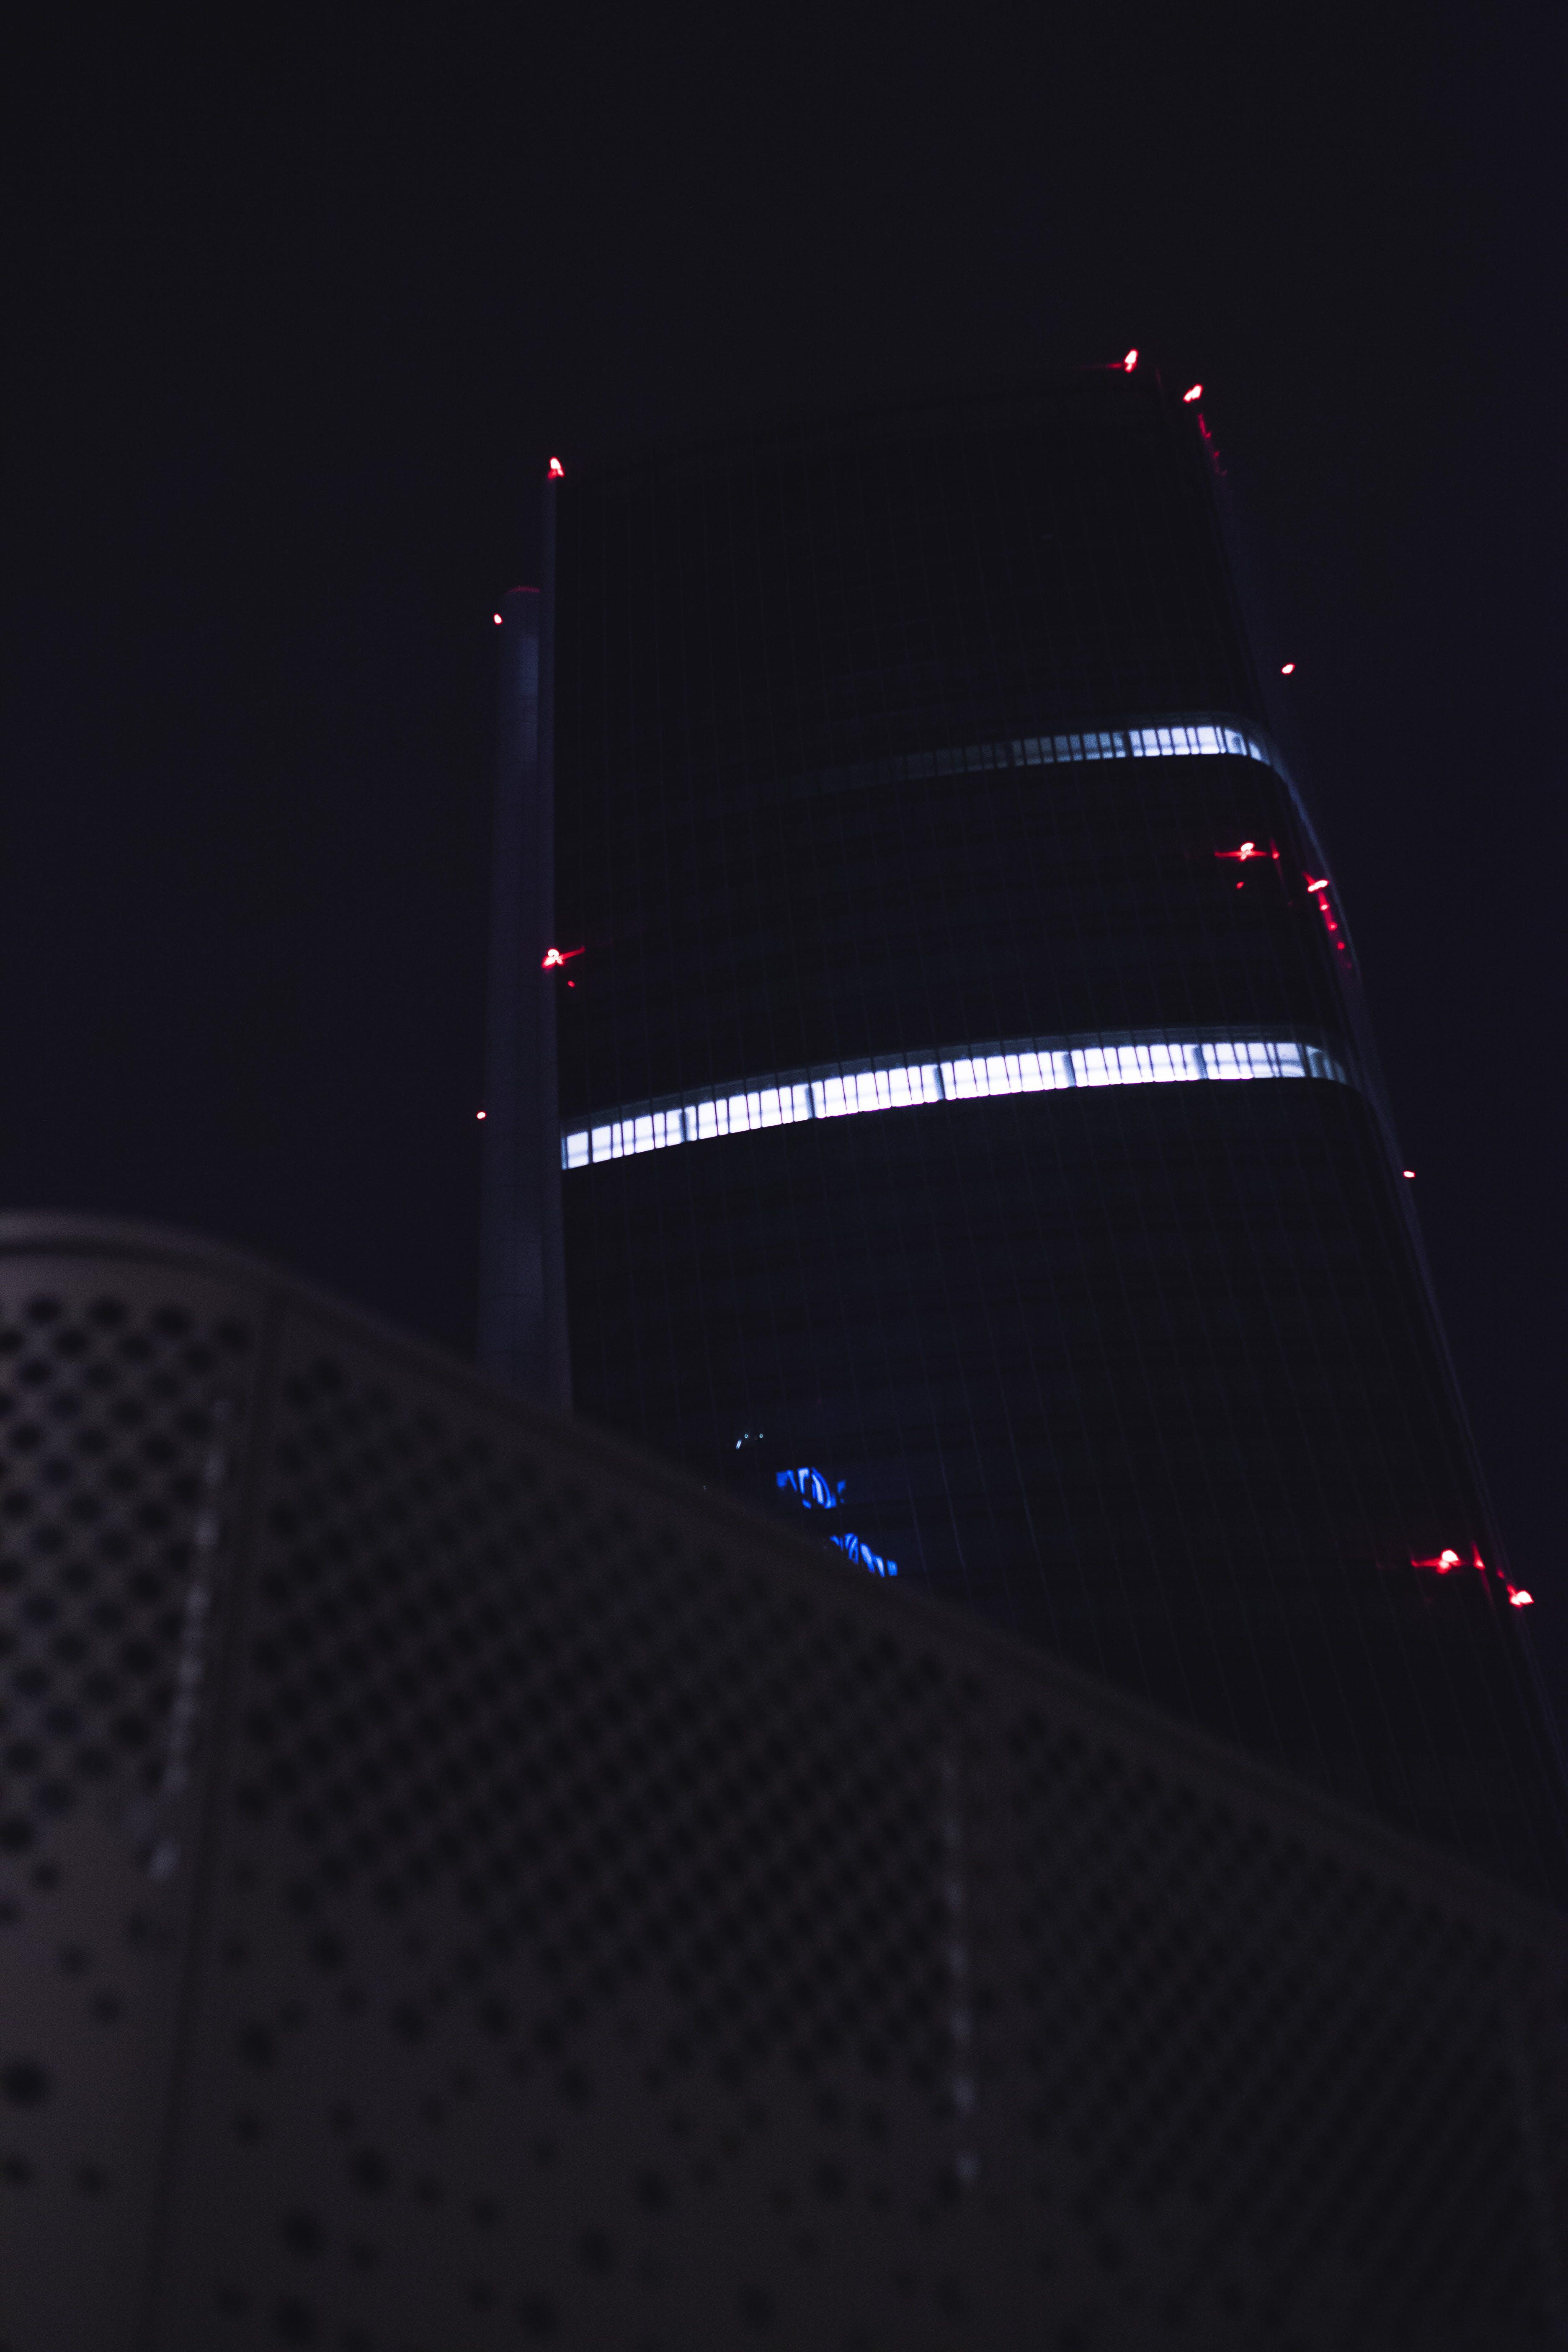 Free stock photo of night, urban, metropolitan, metropolitan area